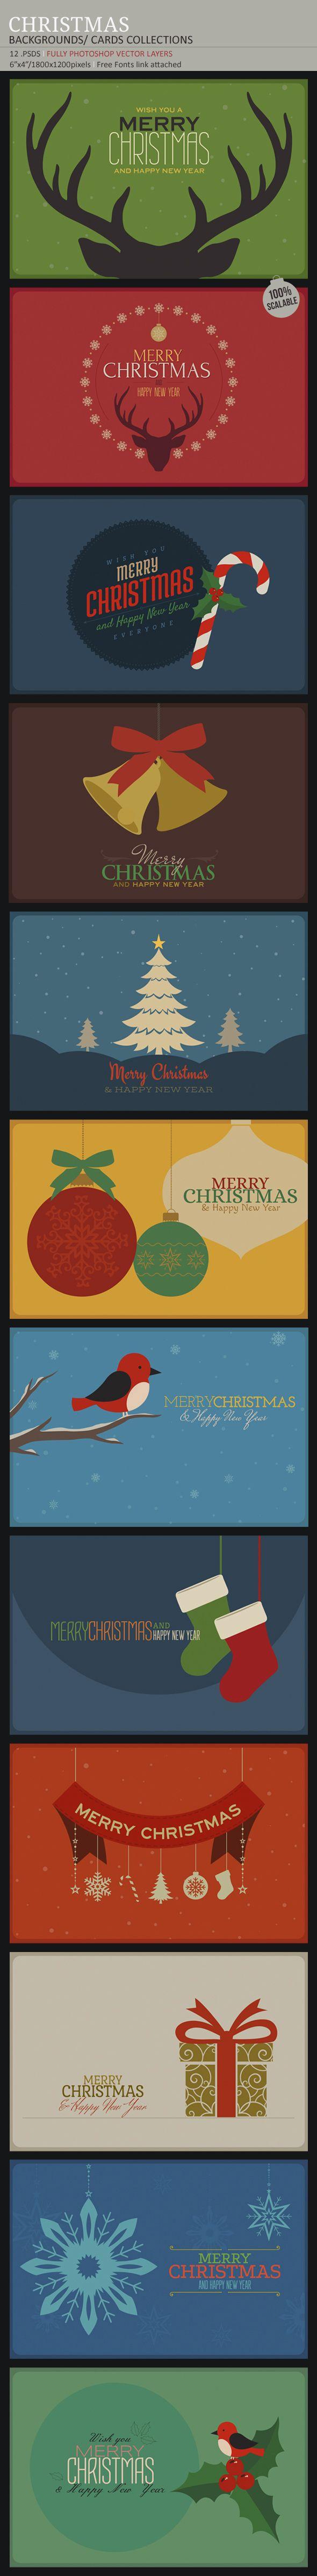 Christmas by creative artx , via Behance